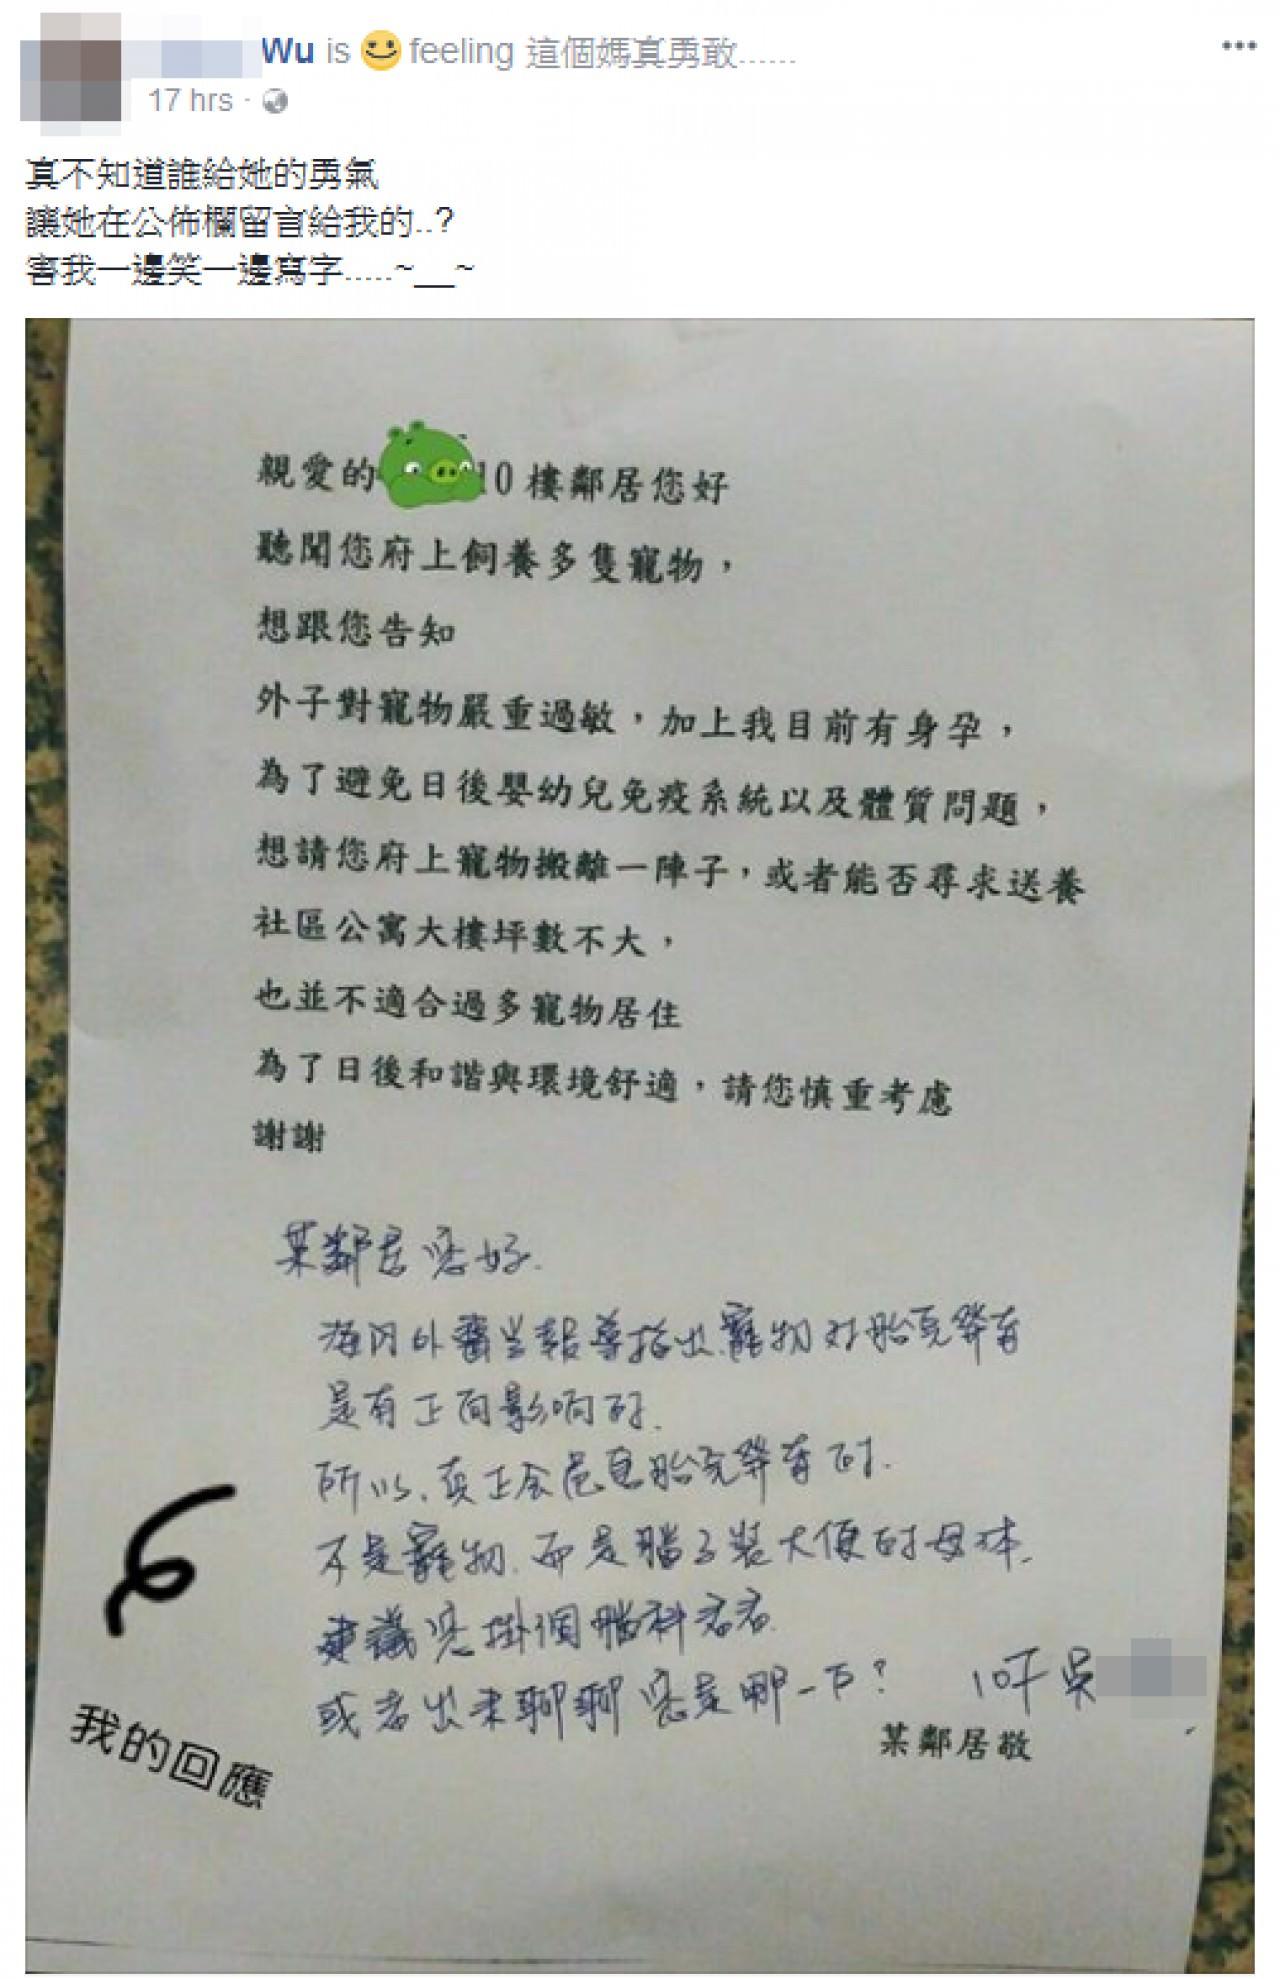 [img]https://cdn.hk01.com/media/images/978092/xlarge/c13b0f13e53c1a18588237b054e73e82.jpg[/img]